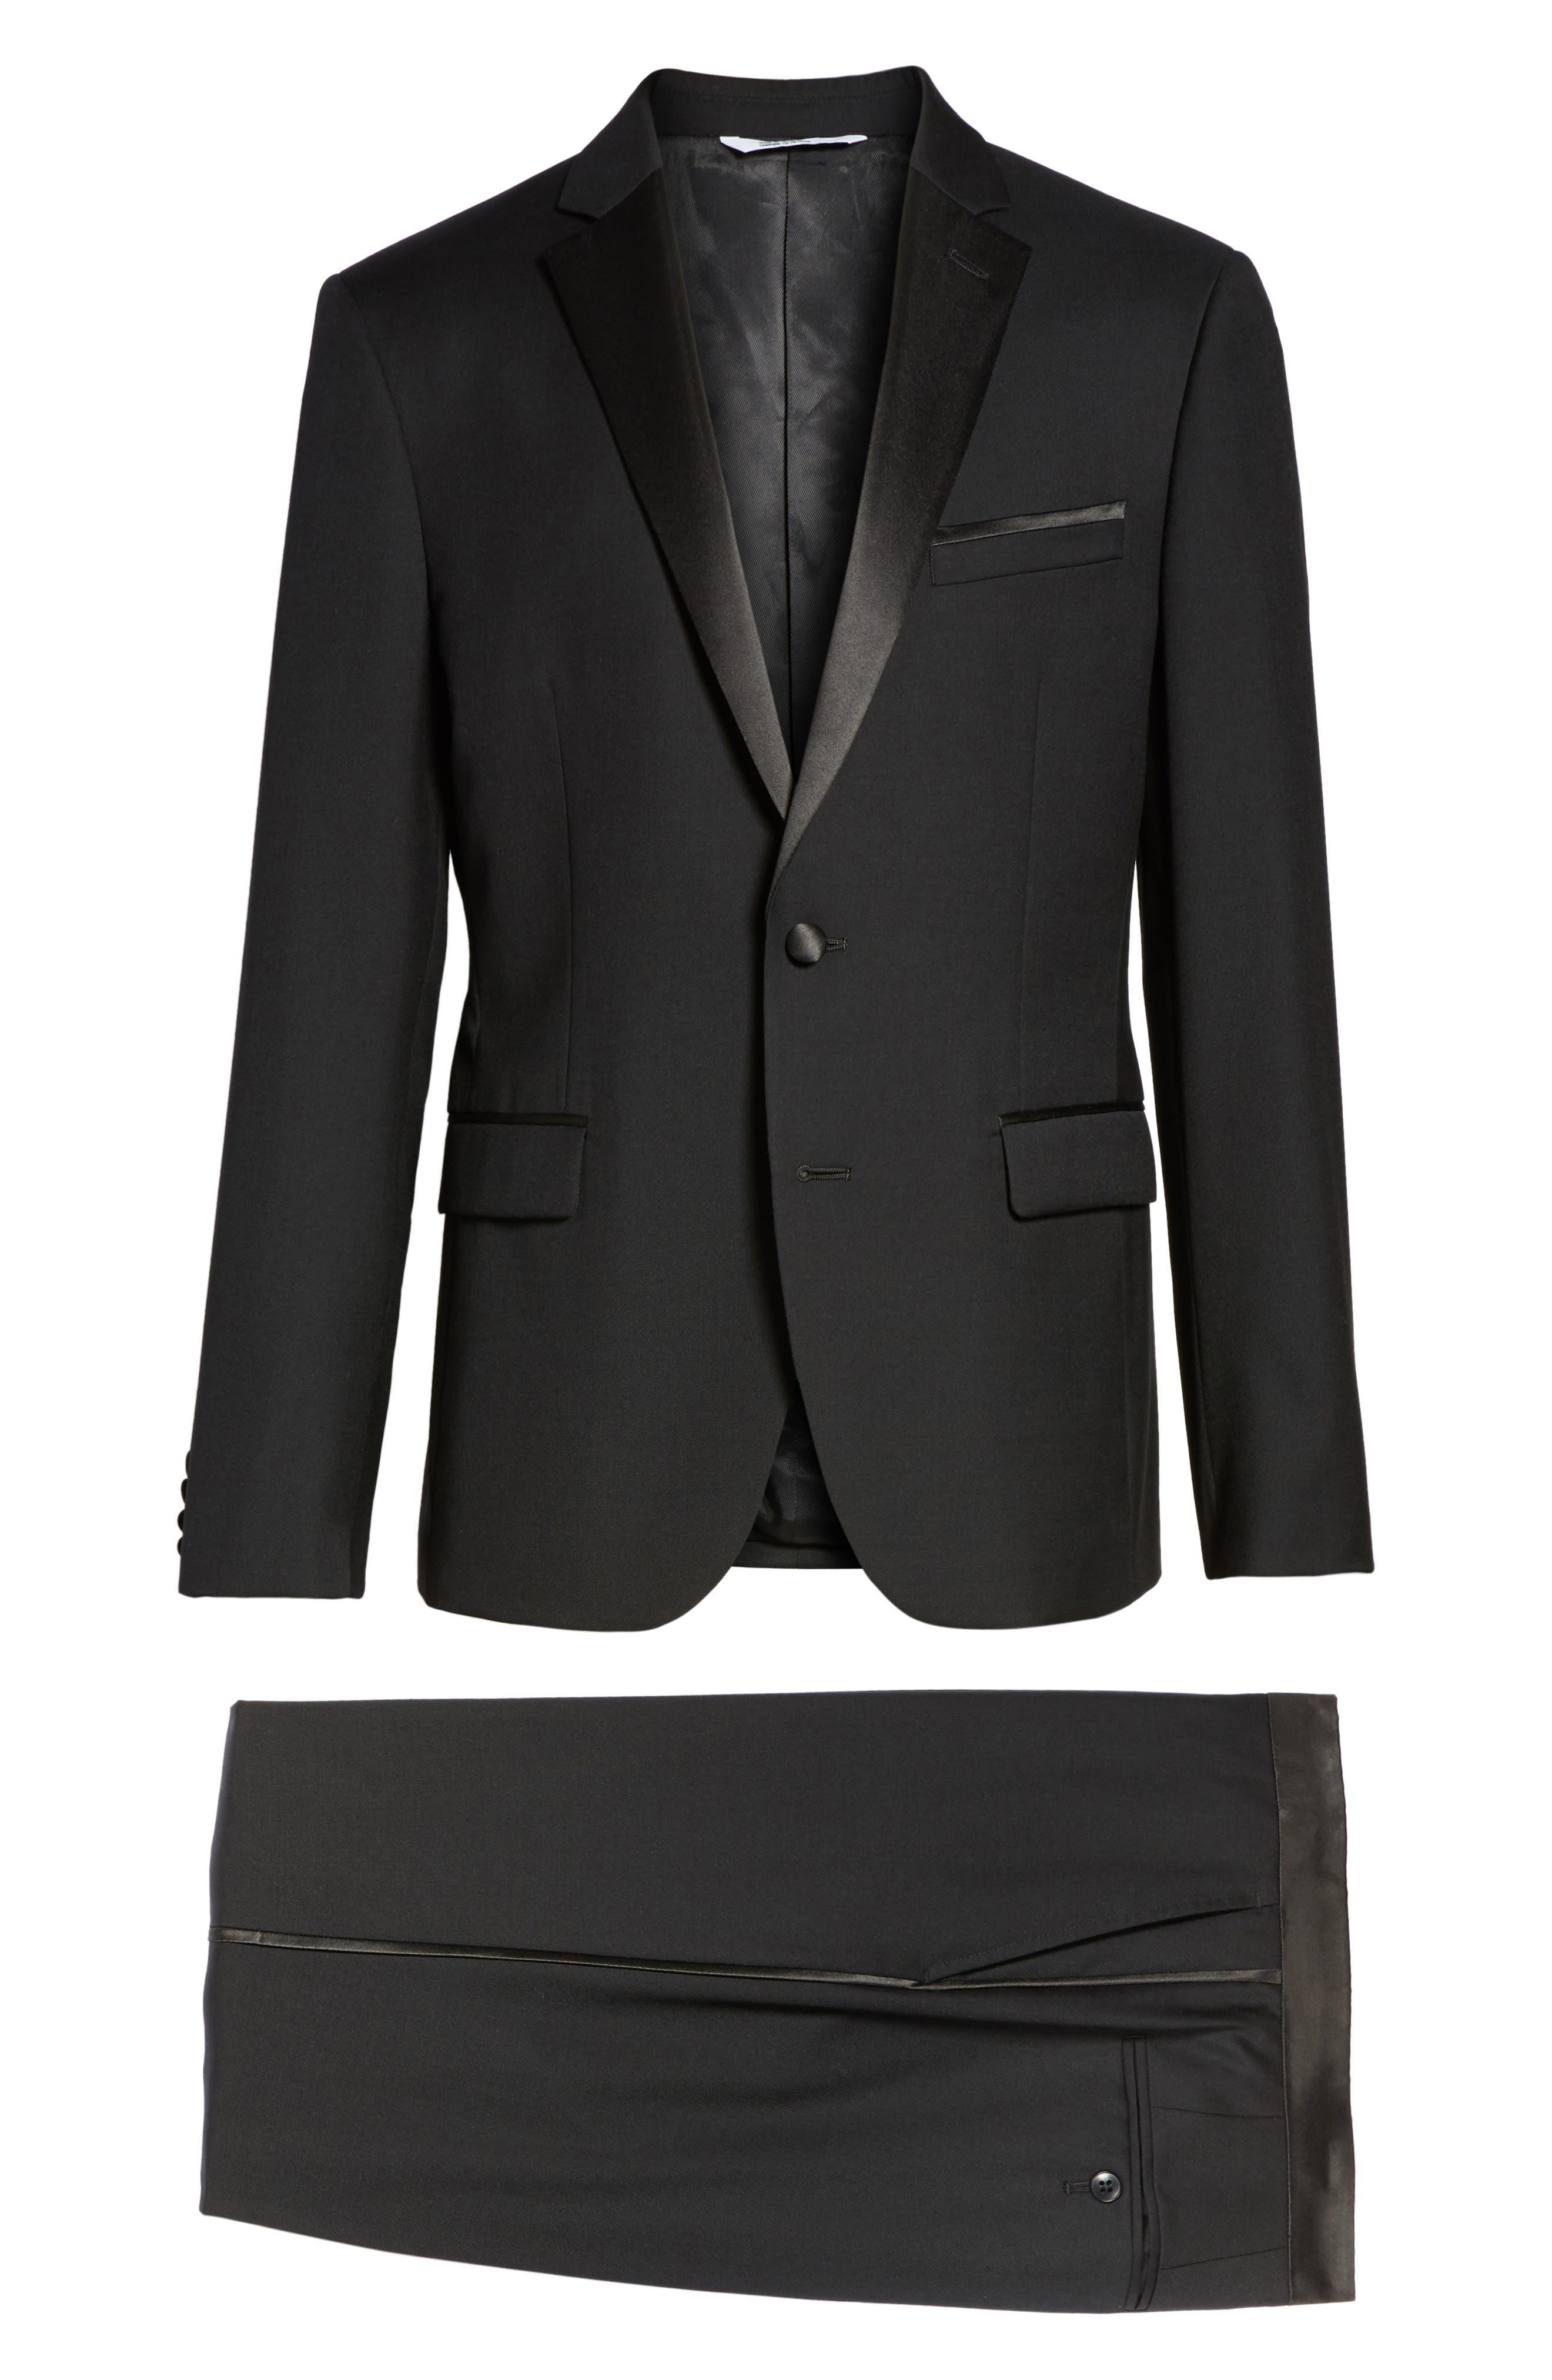 Trim Fit Wool Blend Tuxedo,                             Alternate thumbnail 8, color,                             Black